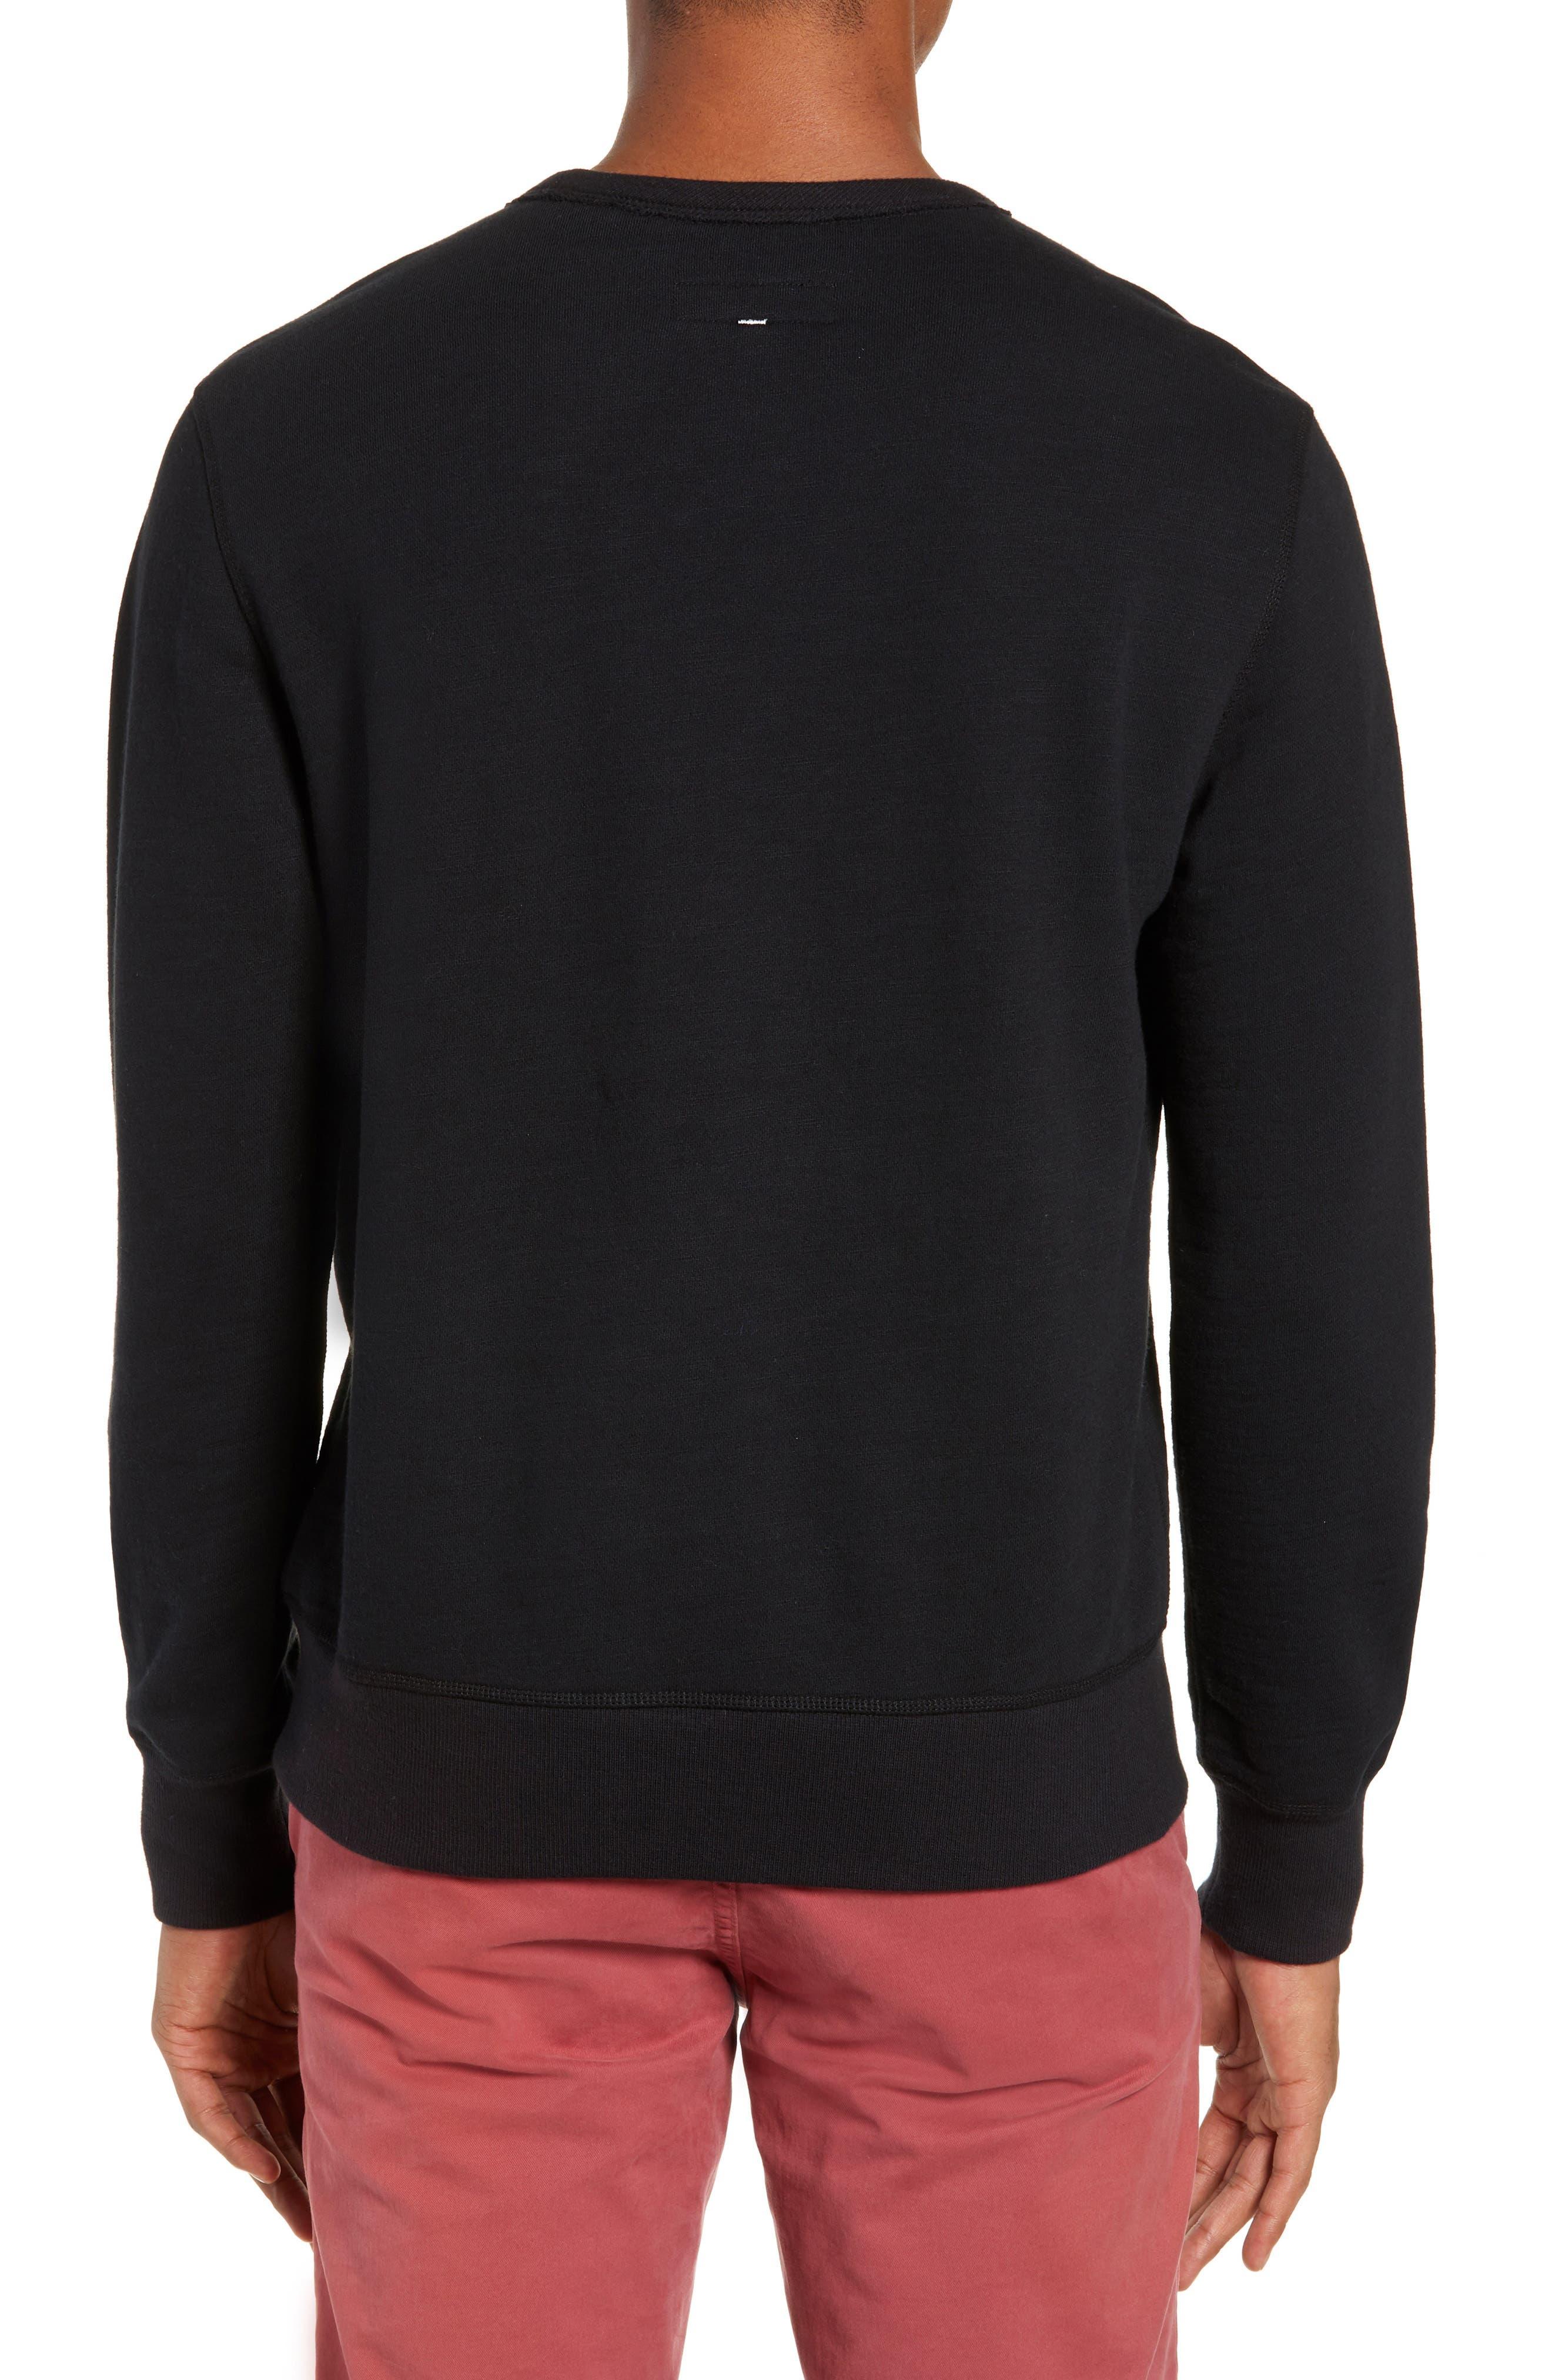 RAG & BONE, Regular Upside Down Sweatshirt, Alternate thumbnail 2, color, 001